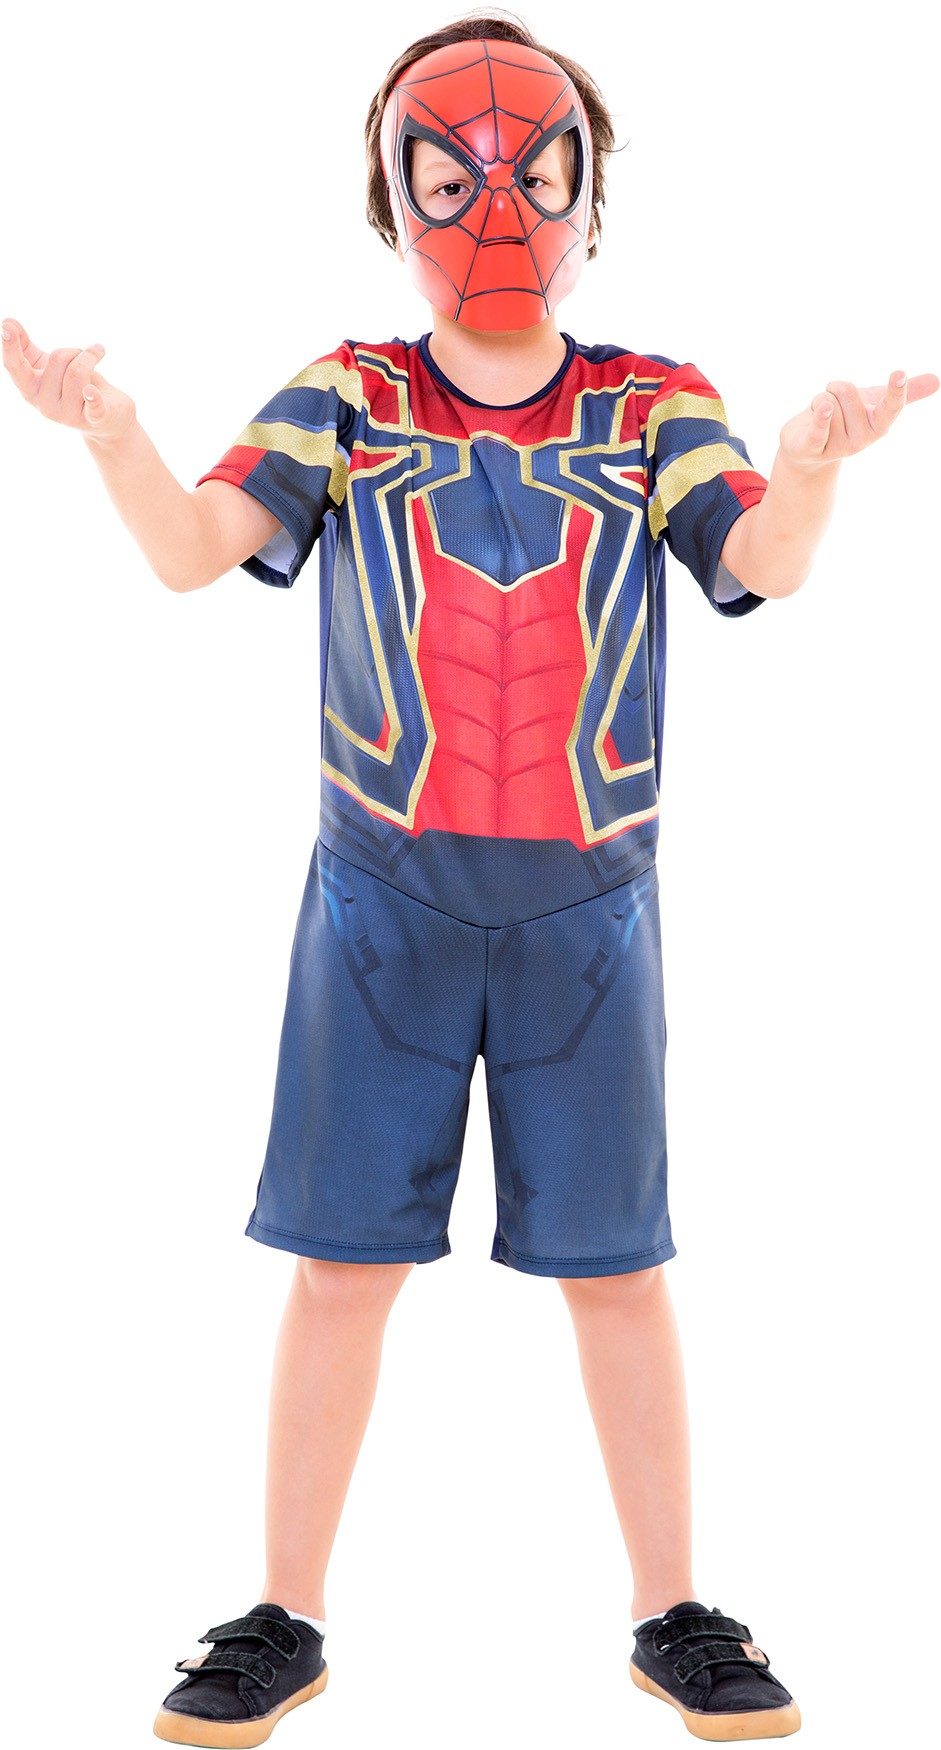 Fantasia Homem Aranha Curto Guerra Infinita Infantil